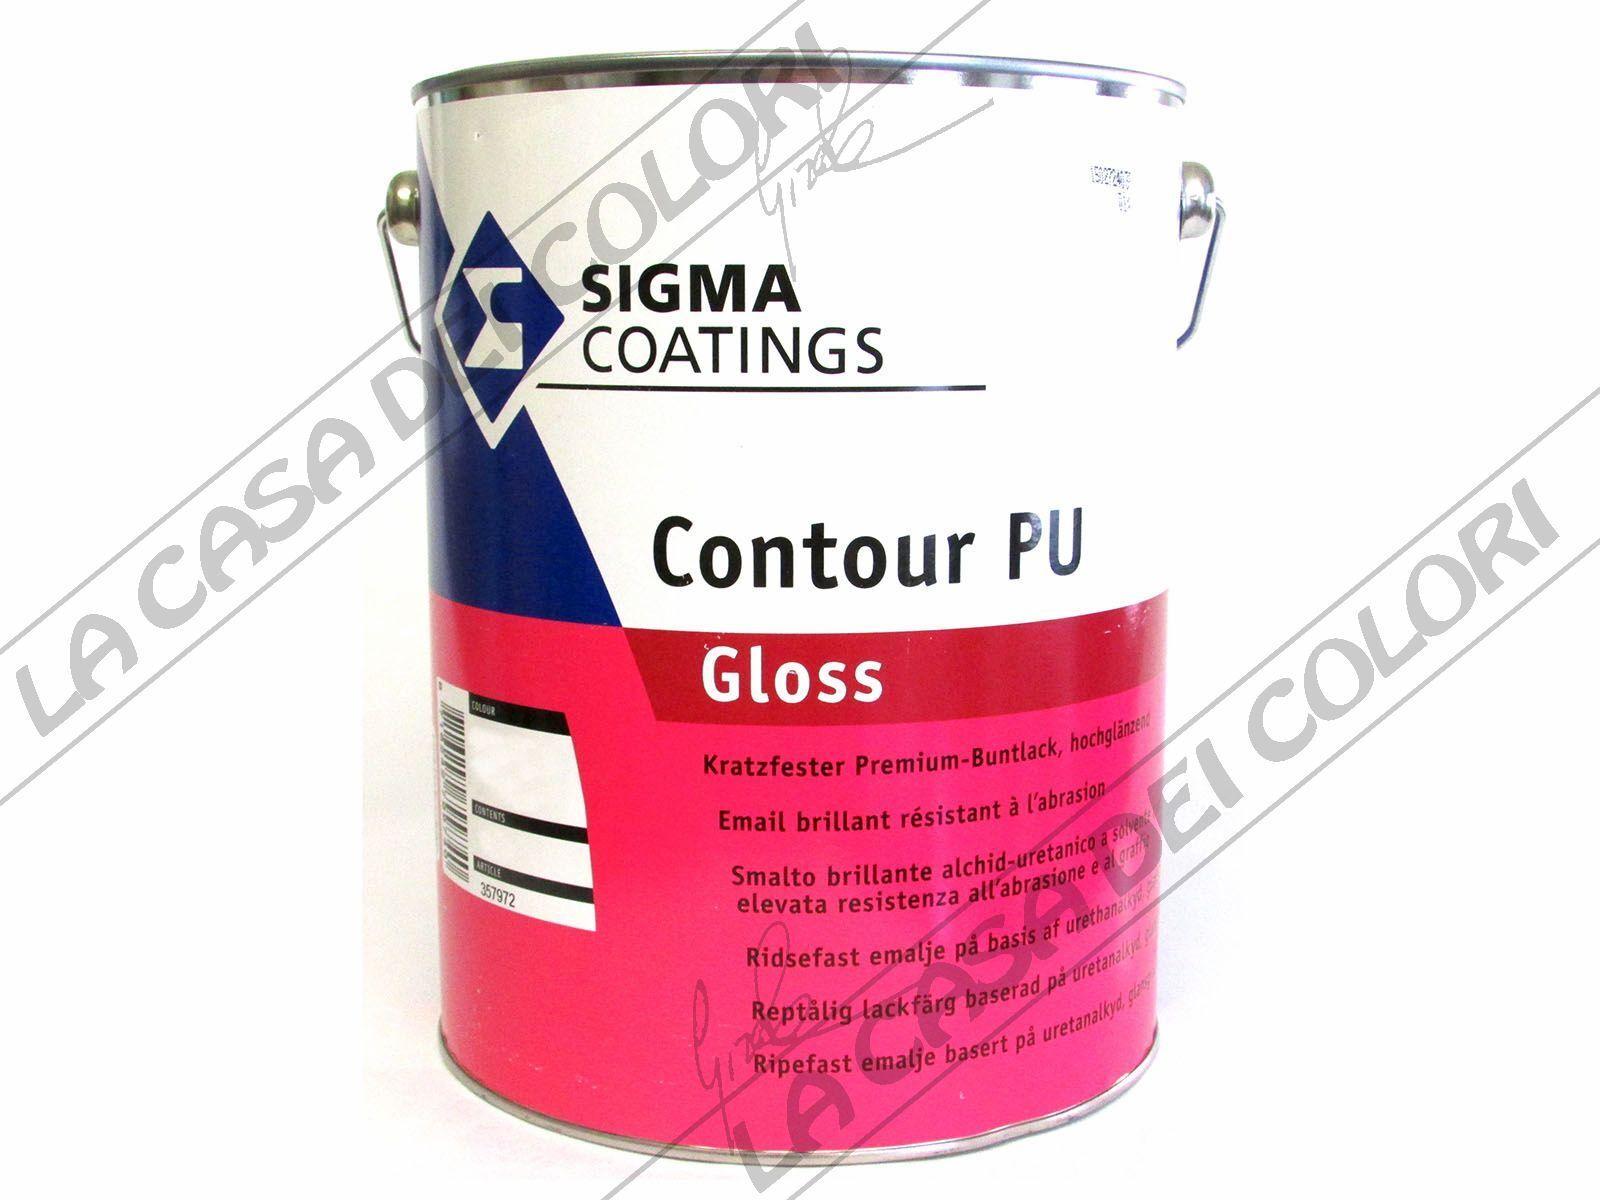 SIGMA COATINGS - CONTOUR PU GLOSS - COATINGS 5 lt - QUALSIASI COLORE -SMALTO ALCHIDICO 801818